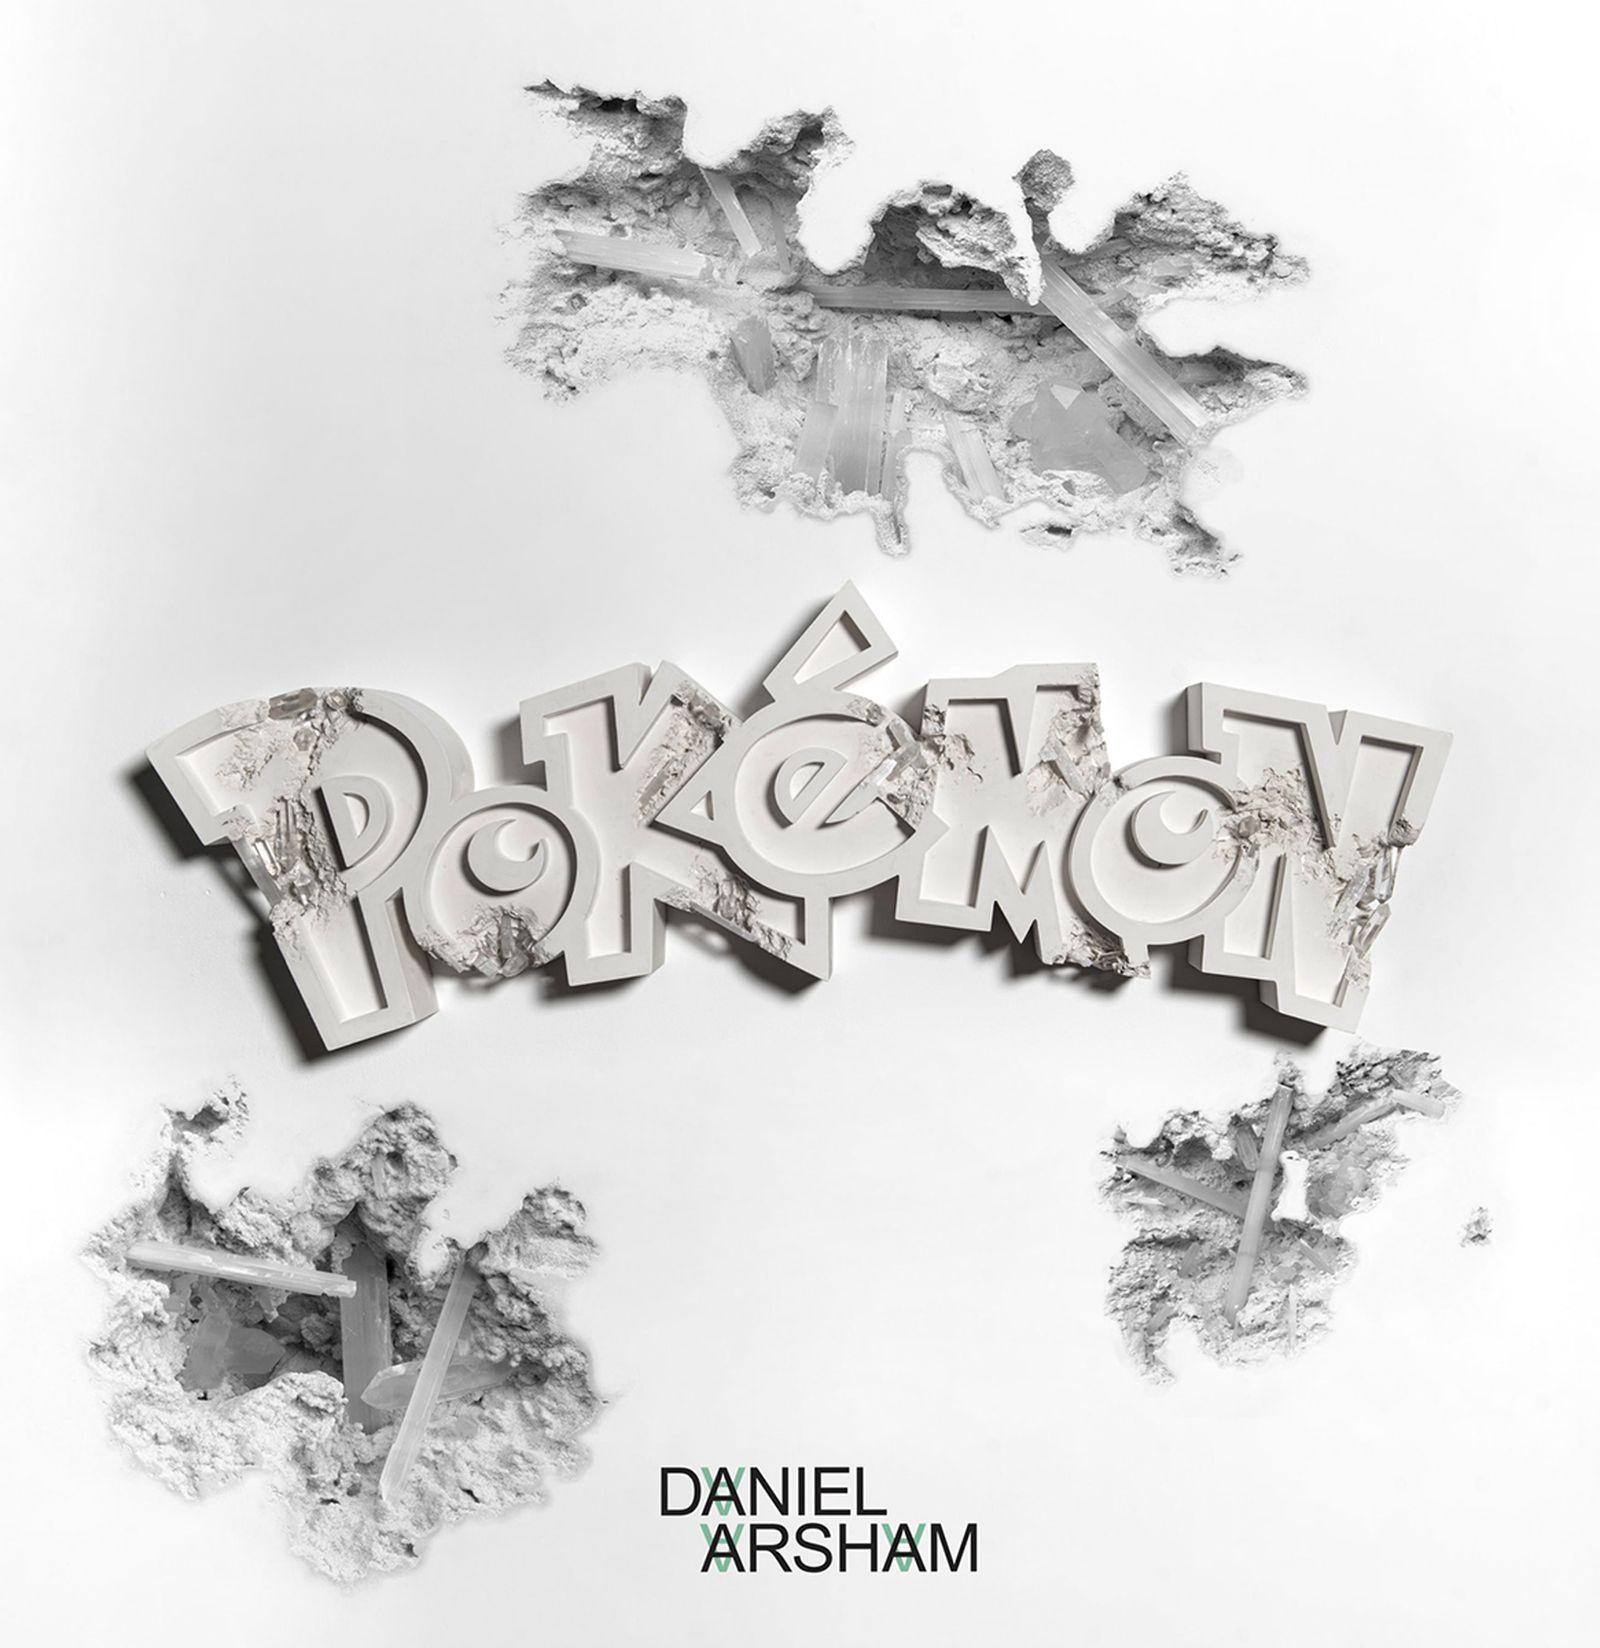 Daniel Arsham x Uniqlo Pokémon Capsule